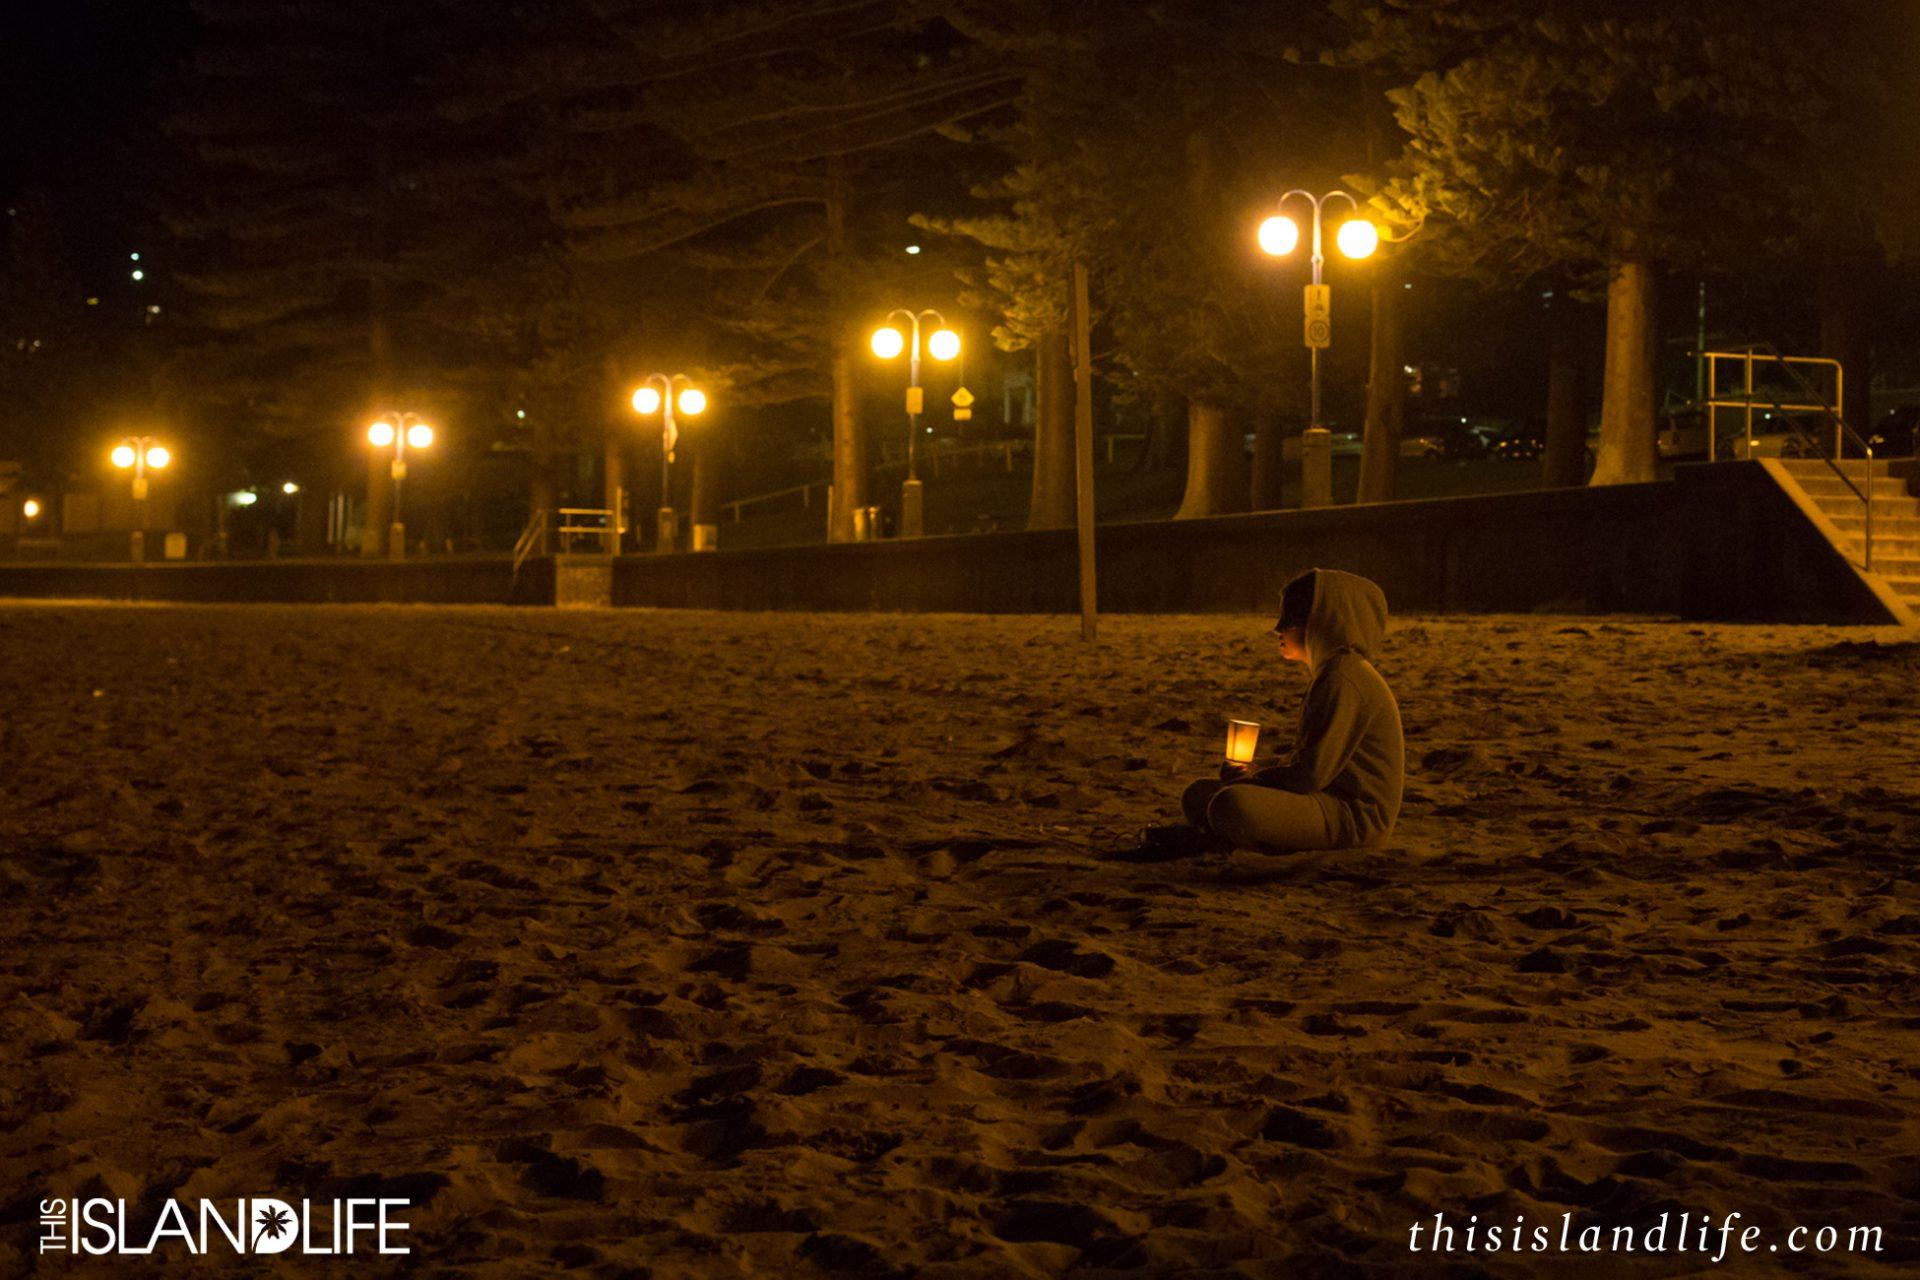 Earth Hour - Manly 2014 - Michaela Skovranova Photography